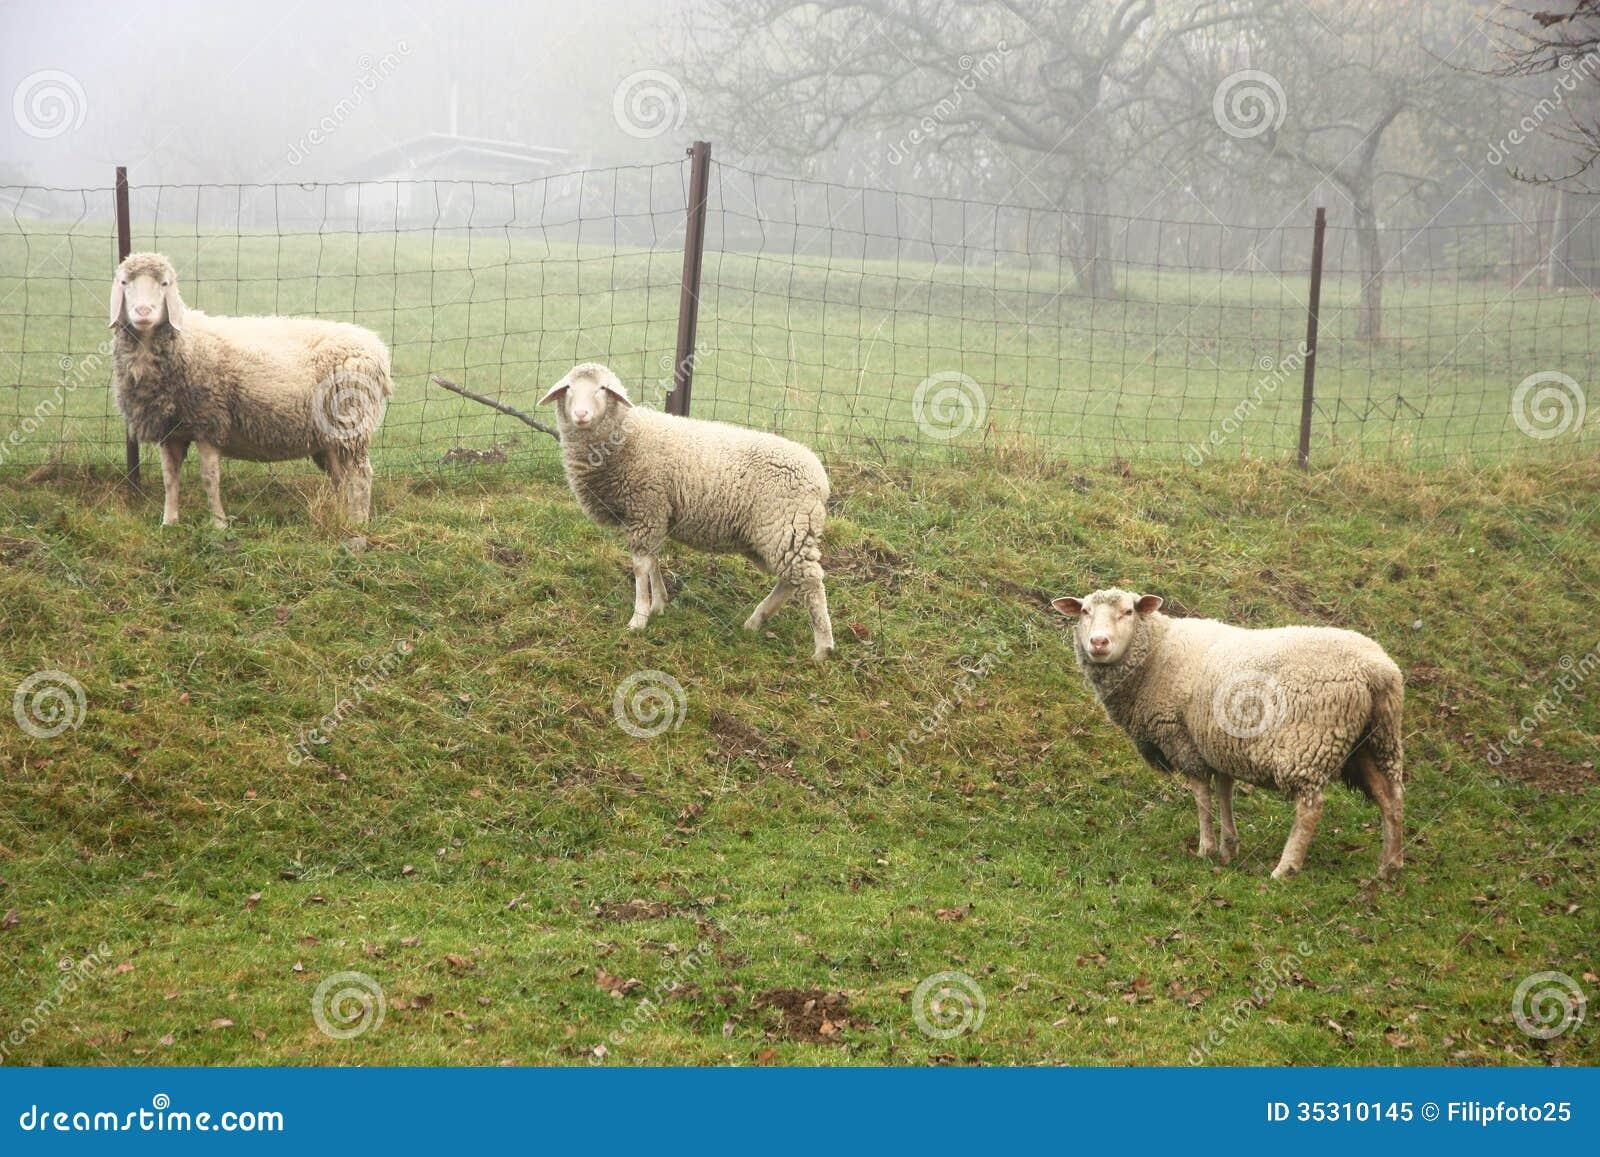 Three sheep - photo#16